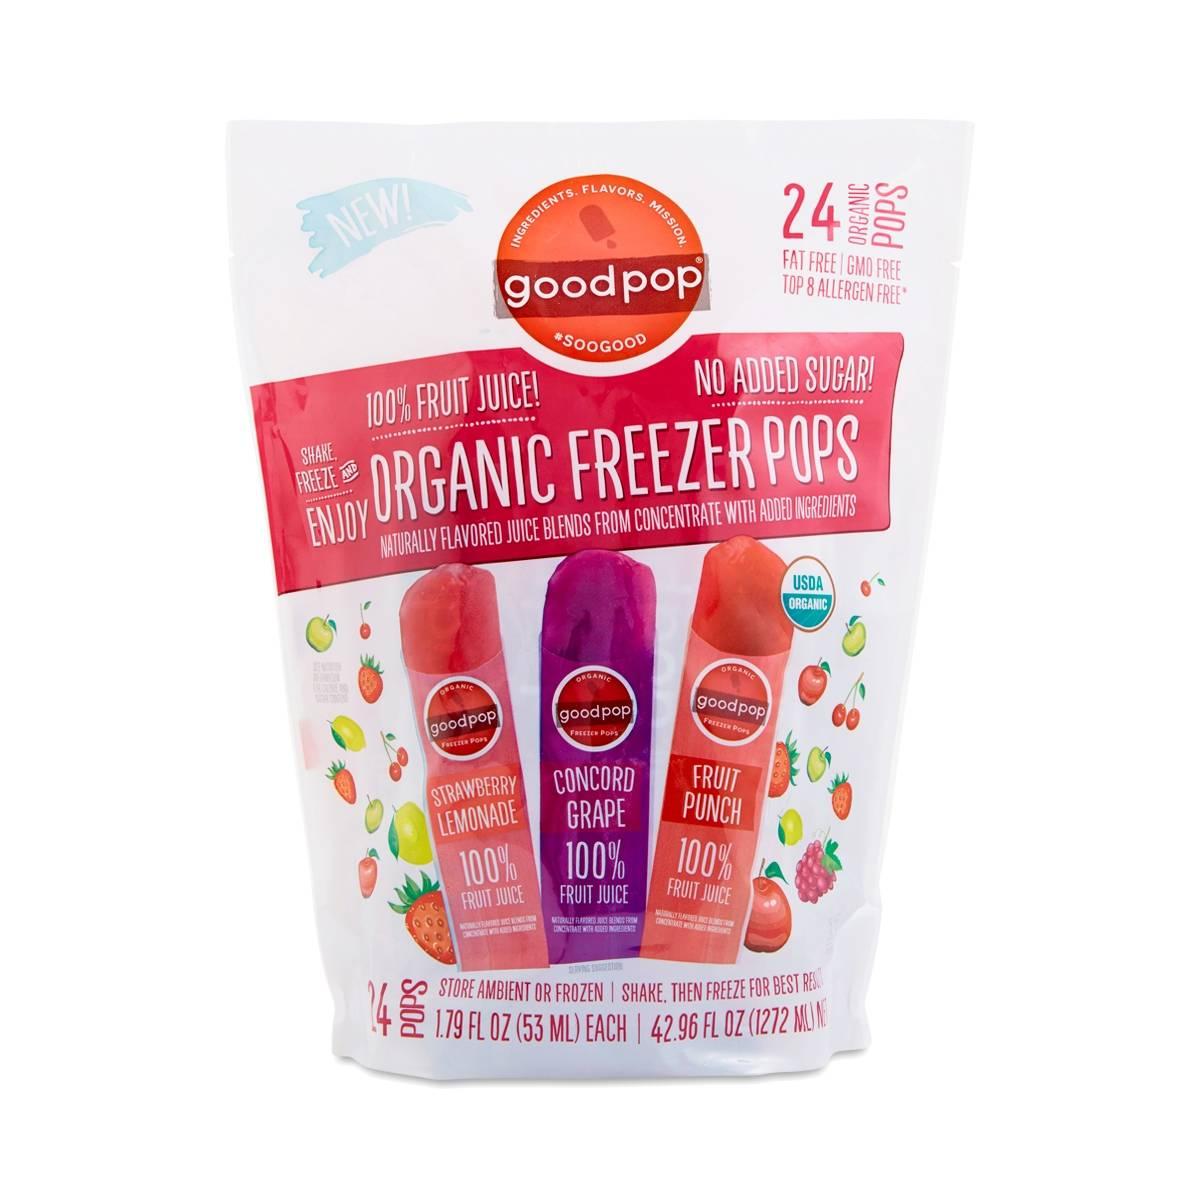 Organic Freezer Pops by GoodPop - Thrive Market